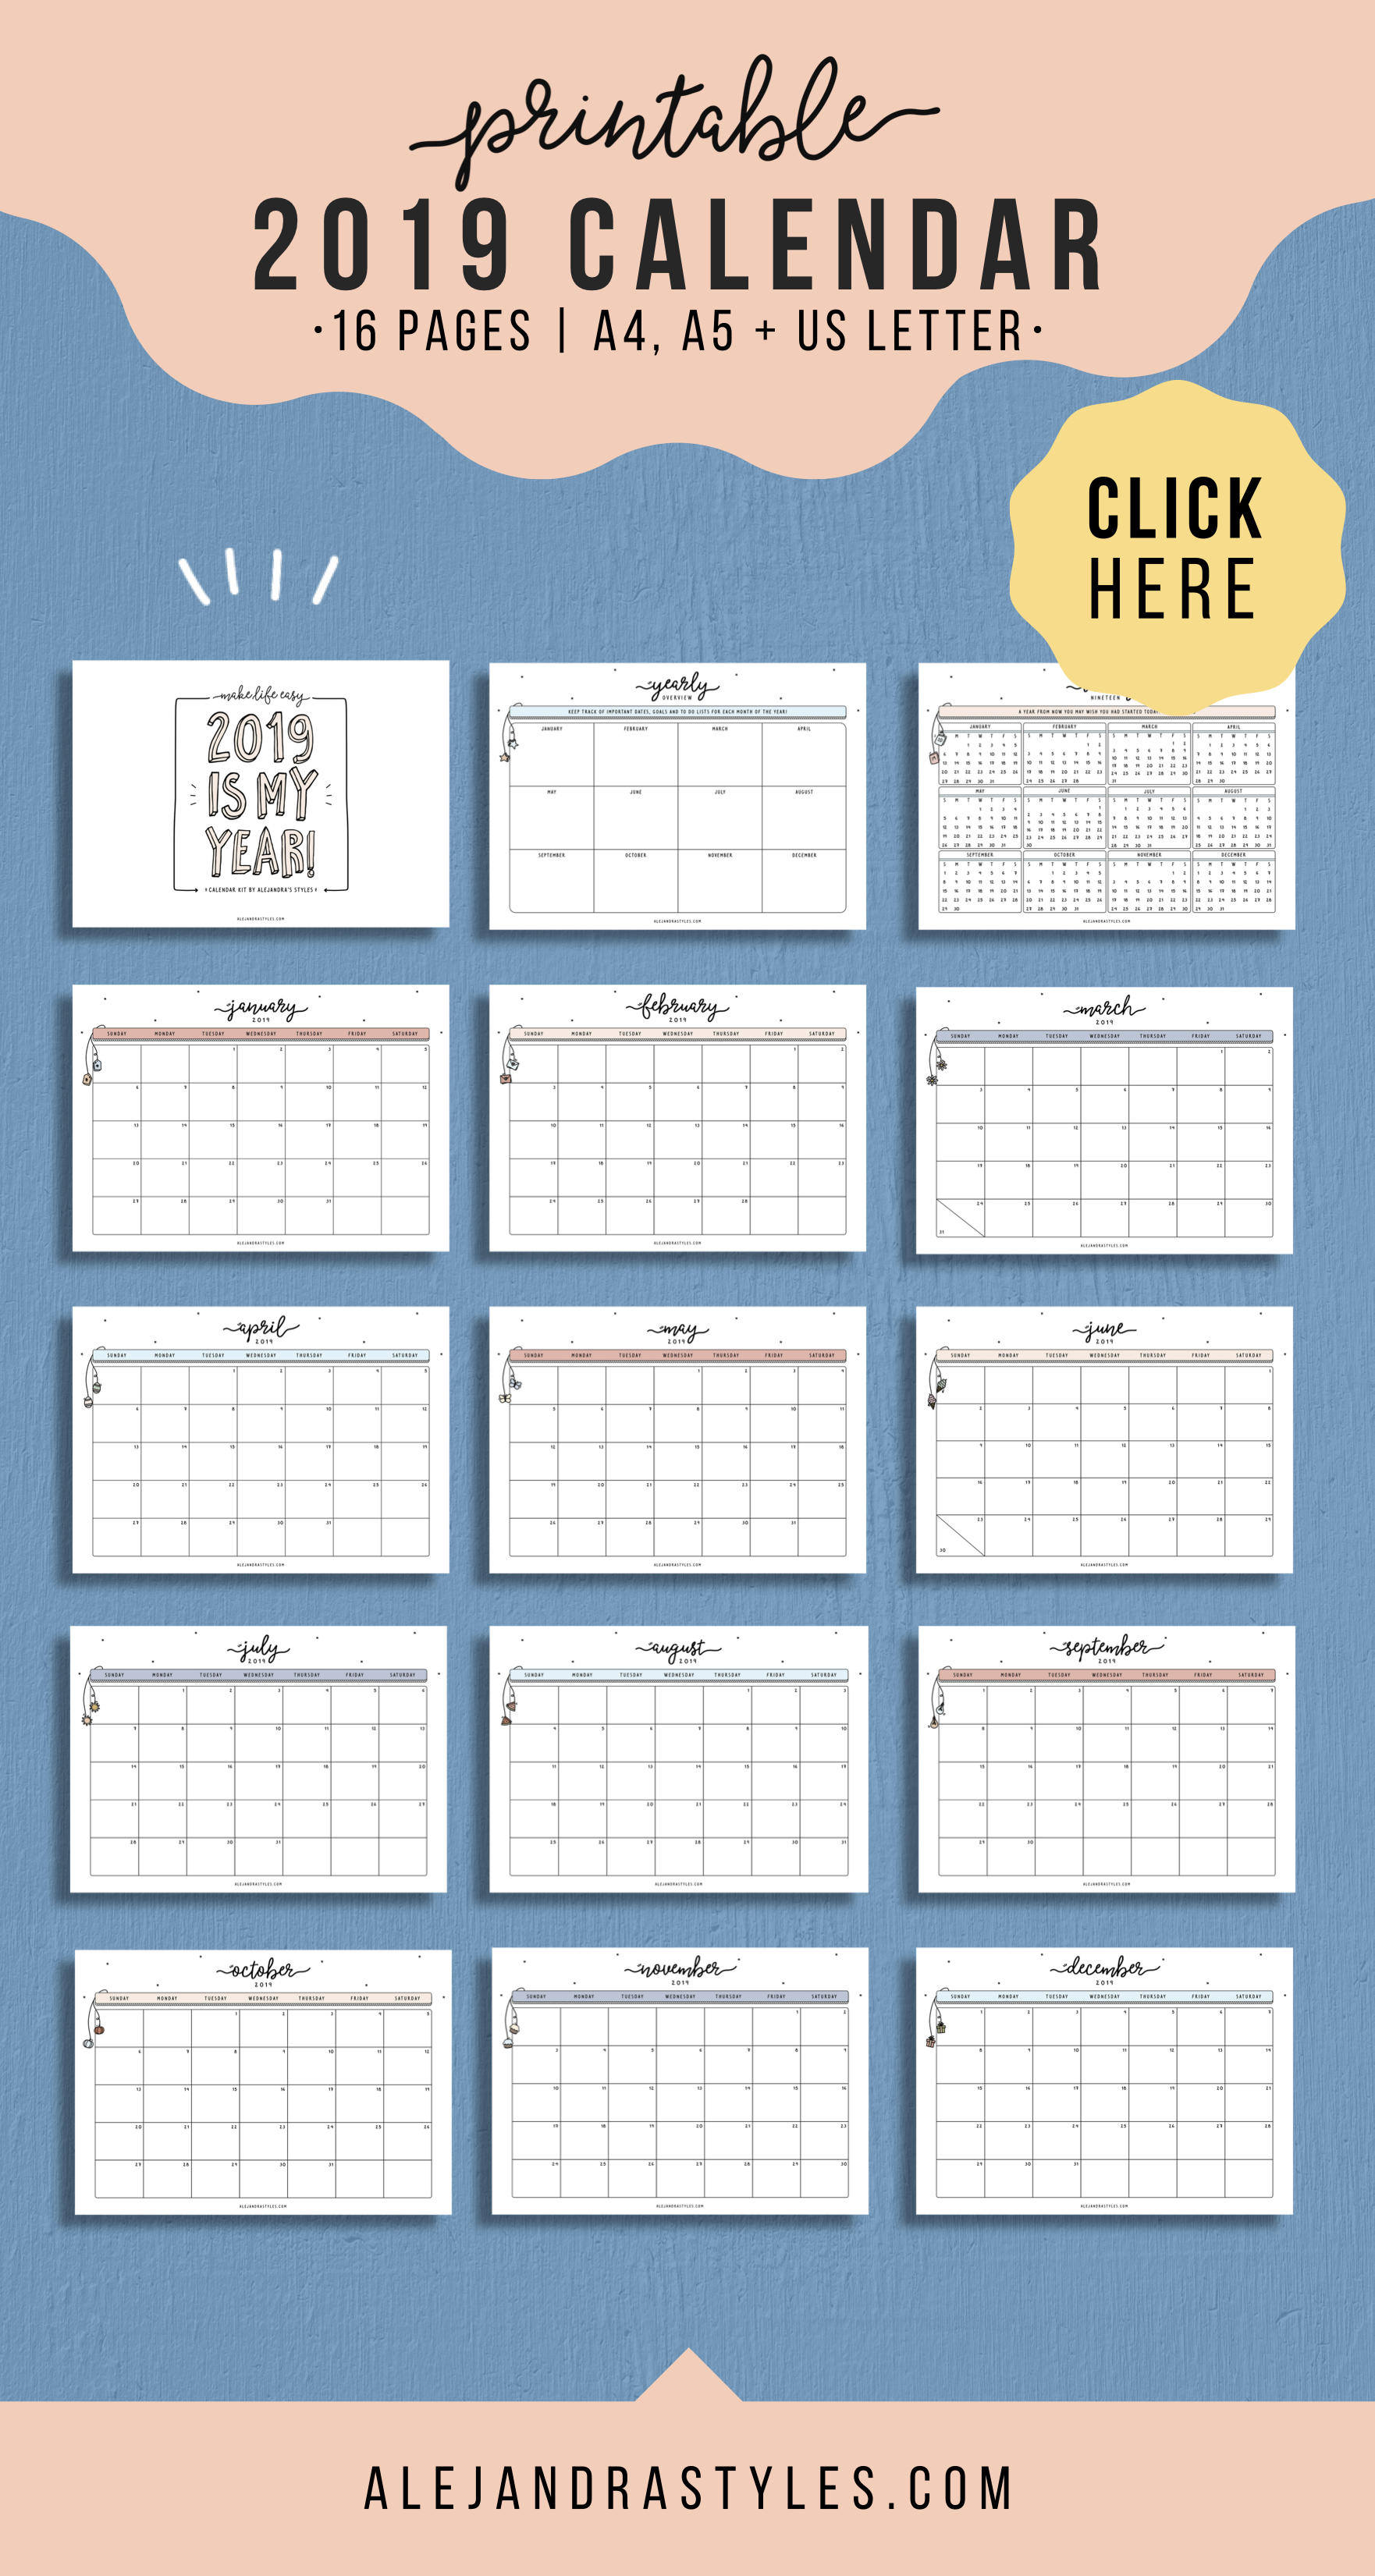 2021 Calendar Printable Planner January 2021 December 2021 Etsy Calendar Printables Printable Planner Monthly Calendar Printable